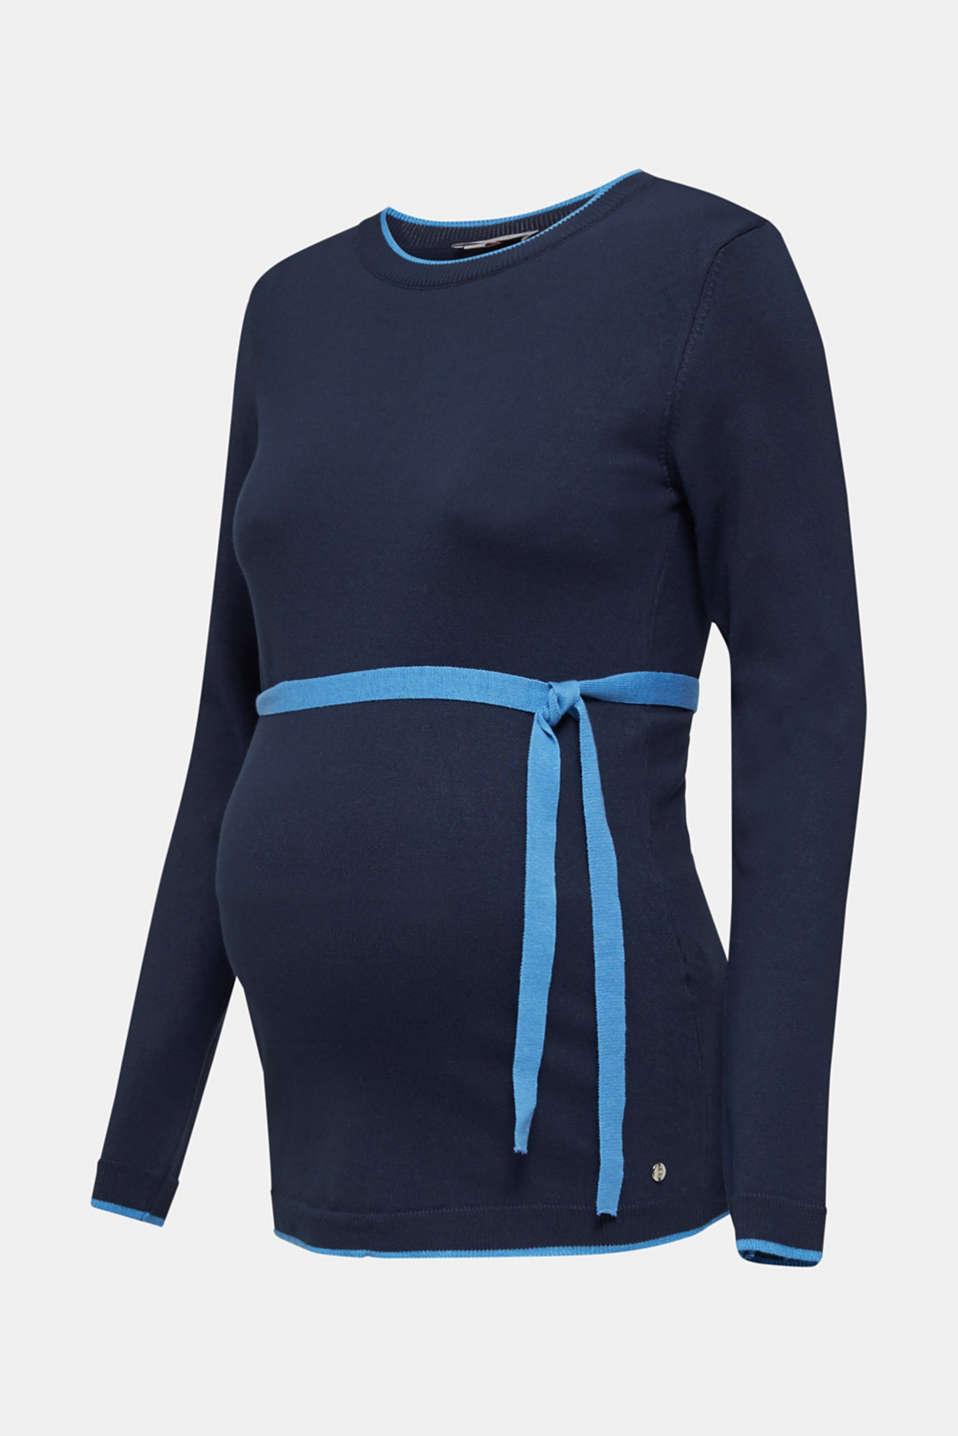 Jumper with contrasting details, LCNIGHT BLUE, detail image number 6